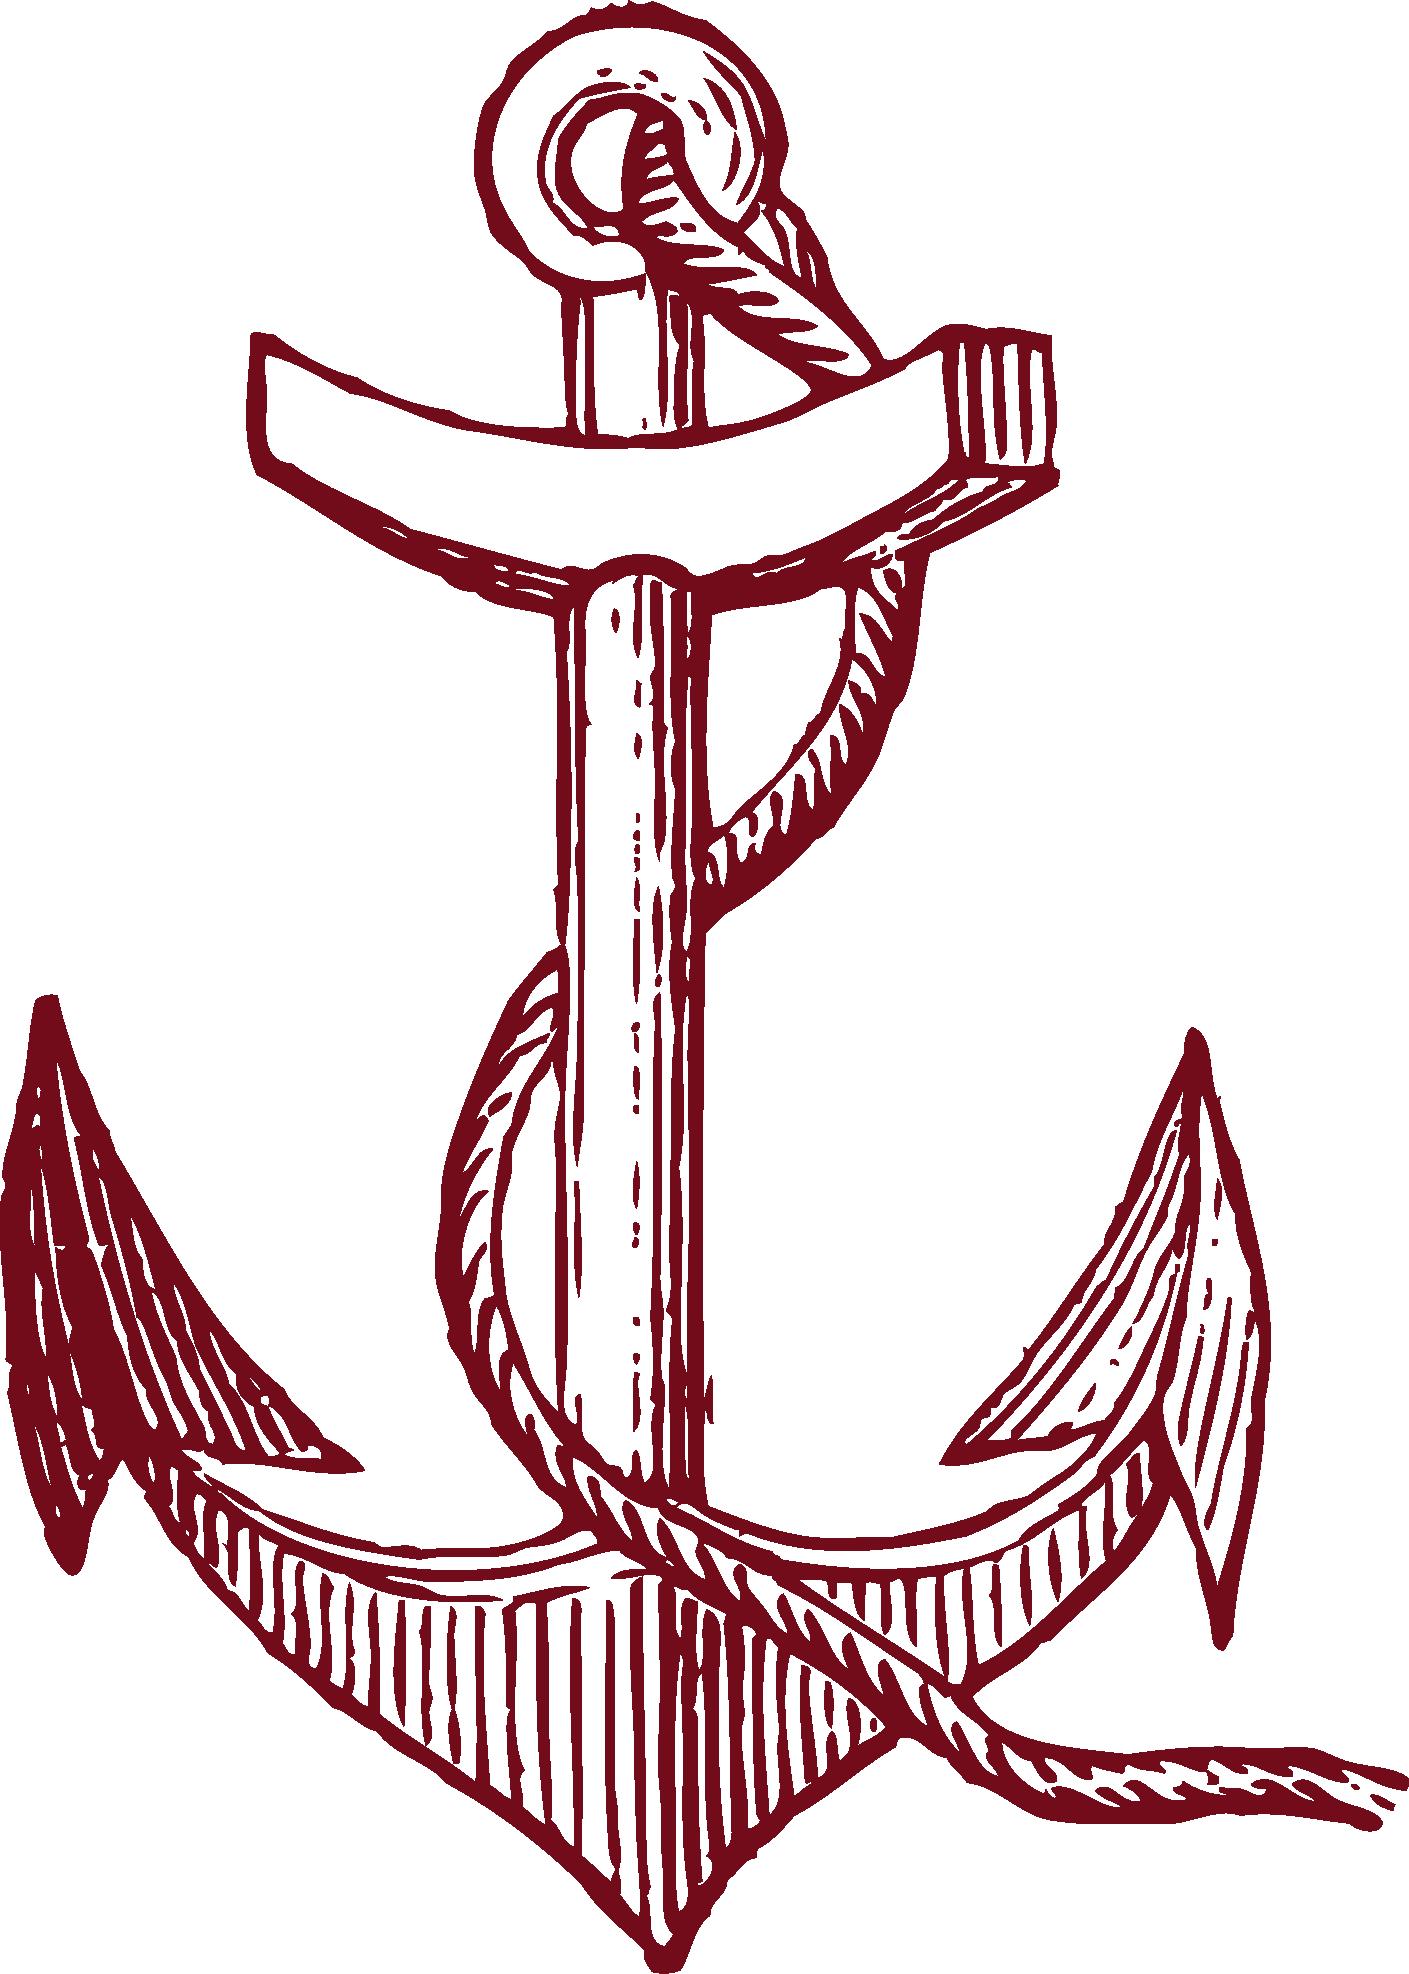 Tattoos drawing clip art. Clipart anchor sailor